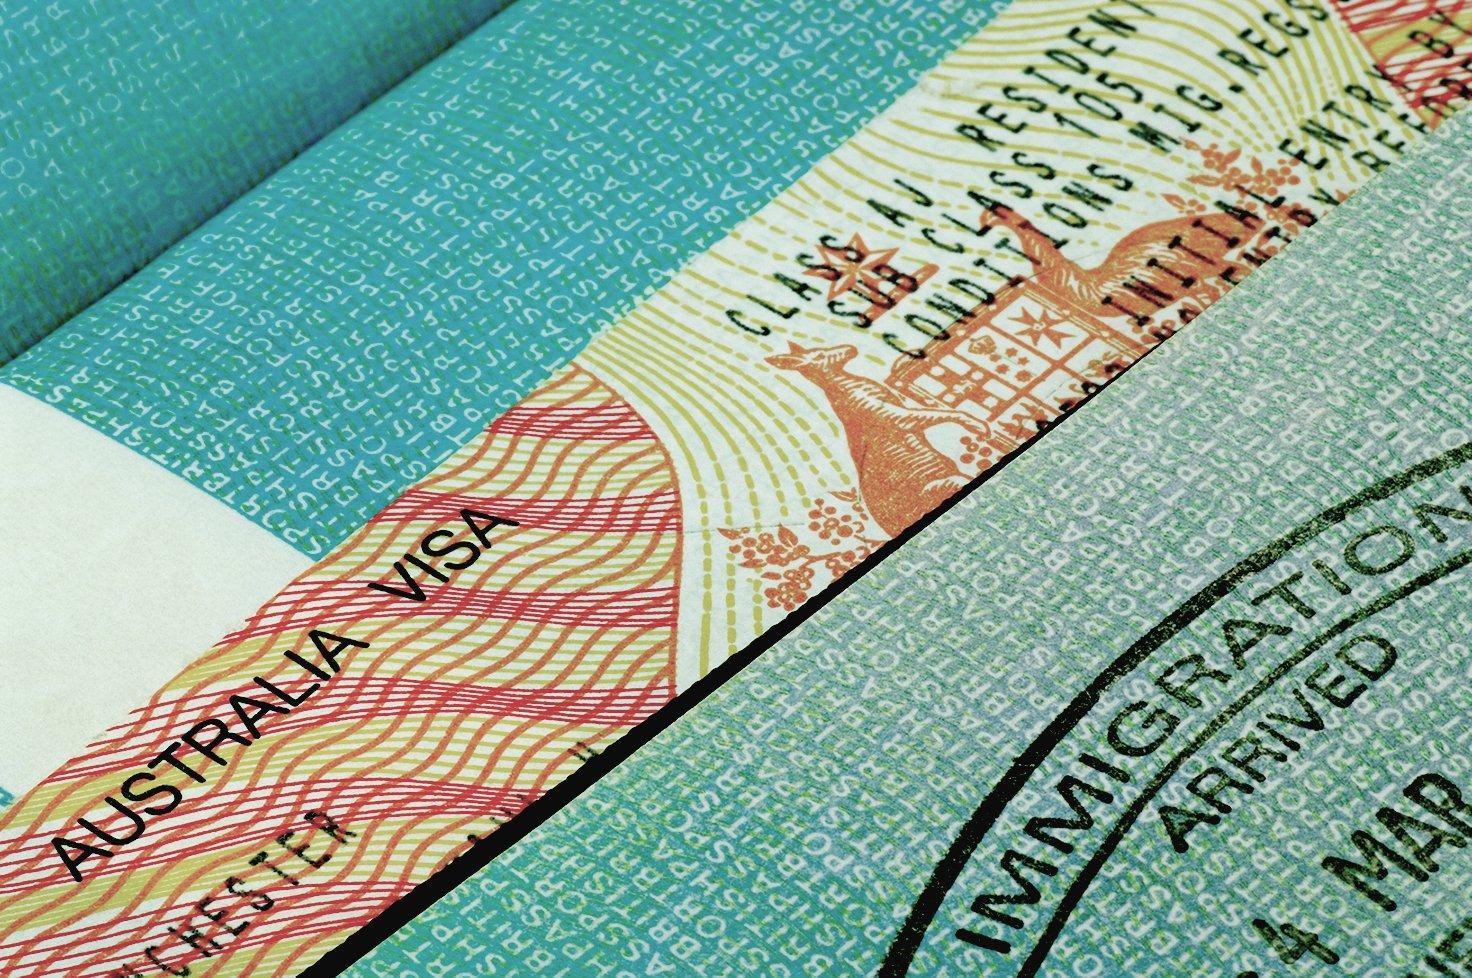 Craddock Murray Neumann Immigration Law Visas